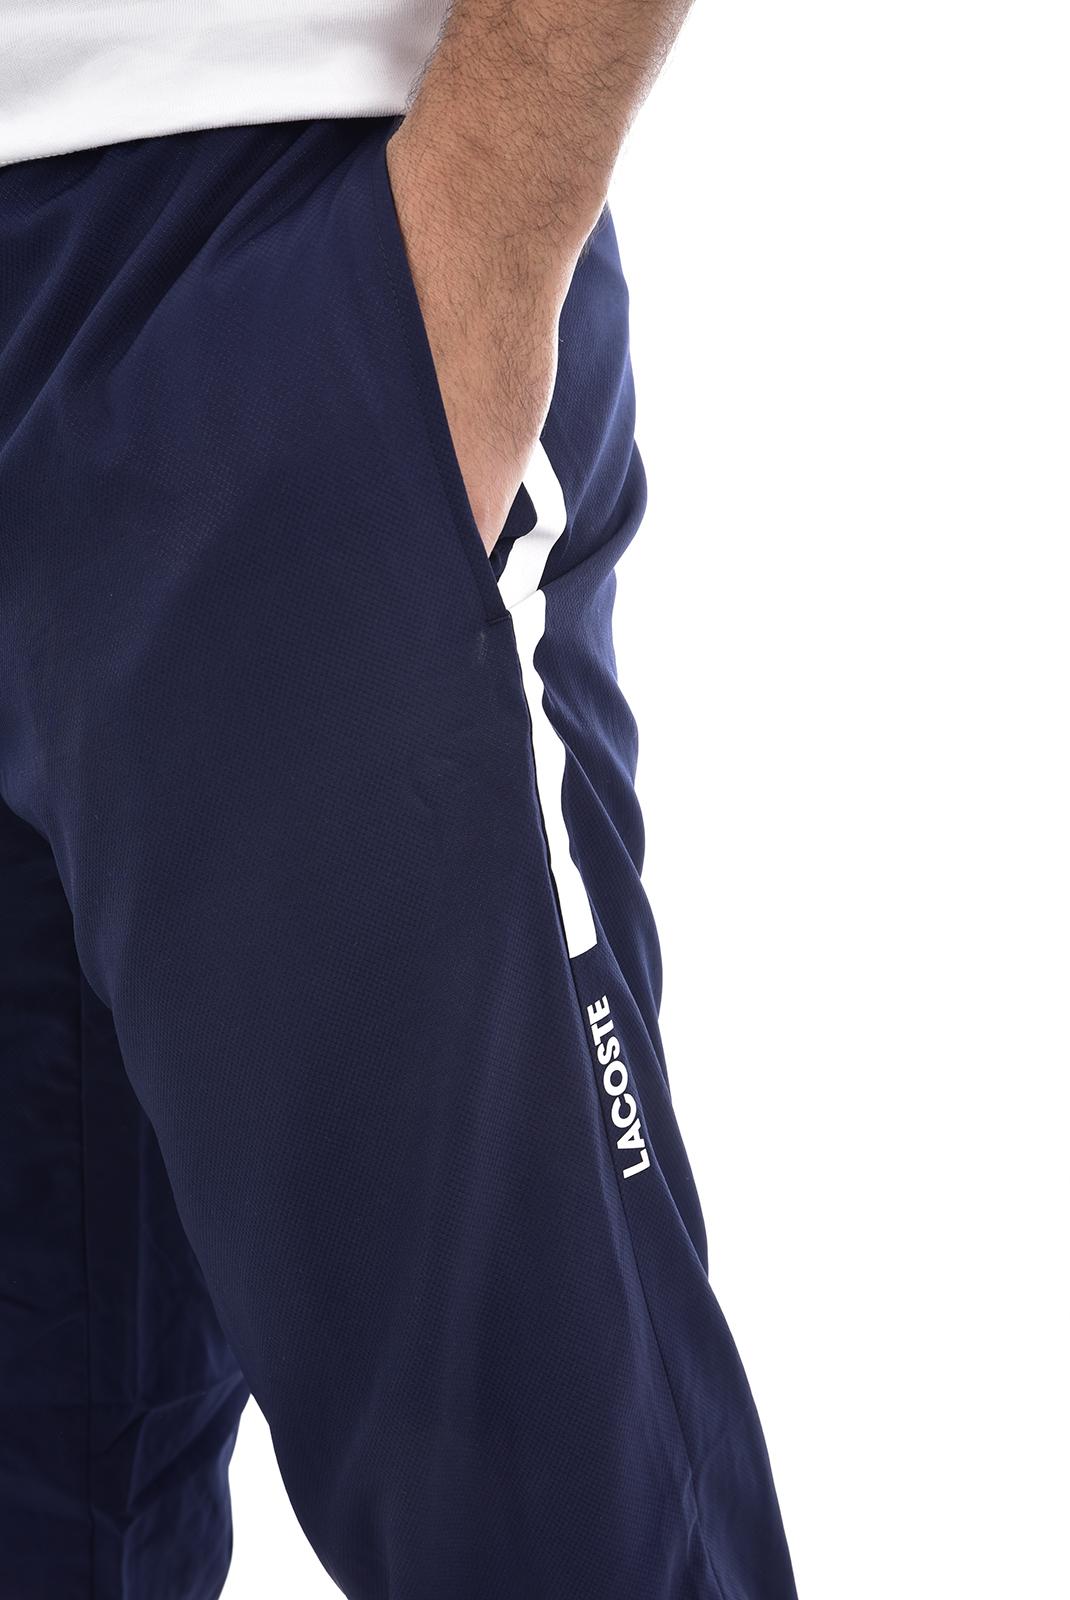 Pantalons sport/streetwear  Lacoste XH3338 525 MARINE